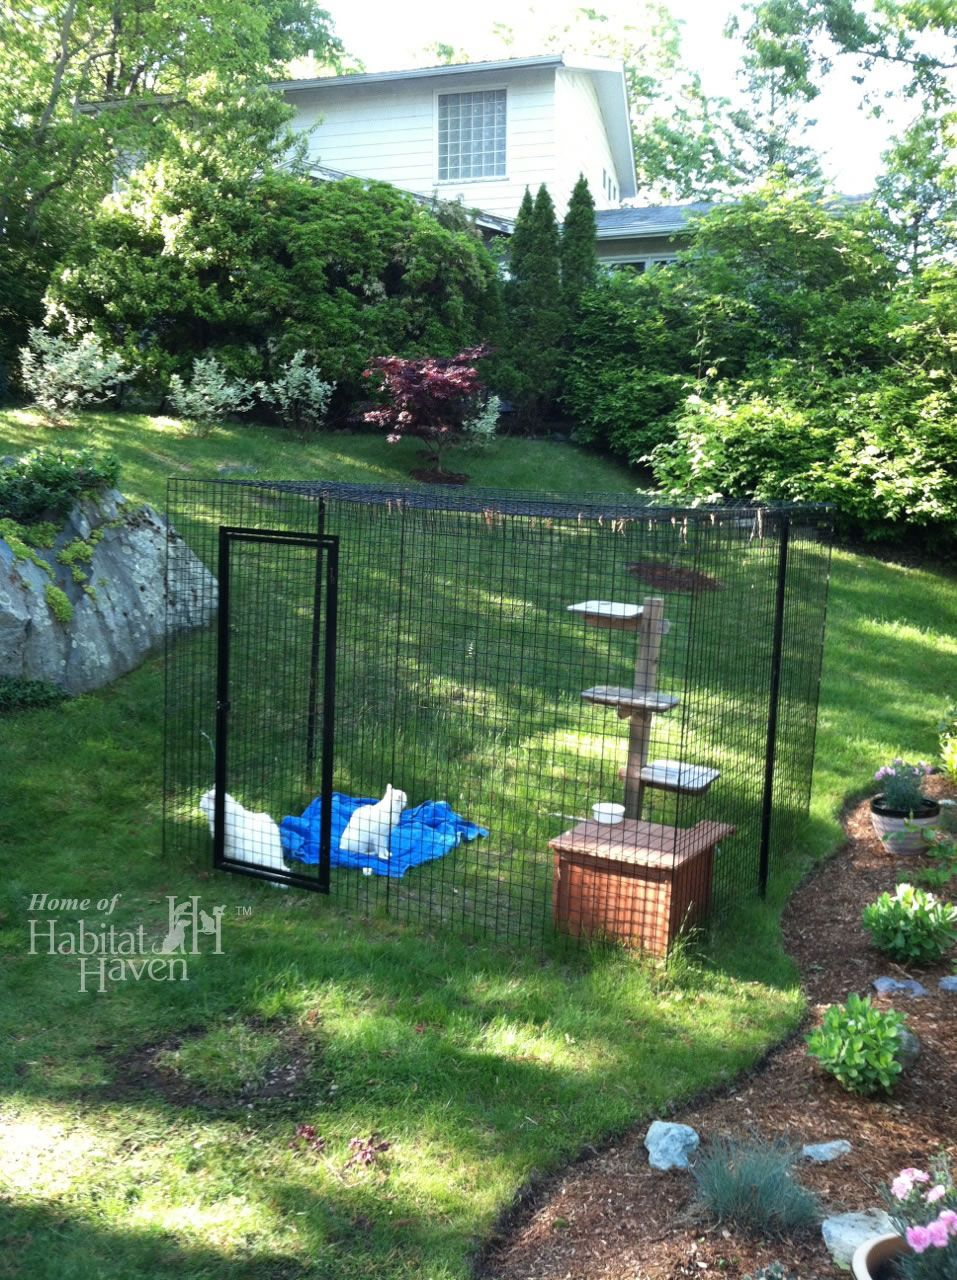 Garden trees names  Safe Friendly Cat and Dog Enclosures  Home of Habitat Haven  Cat